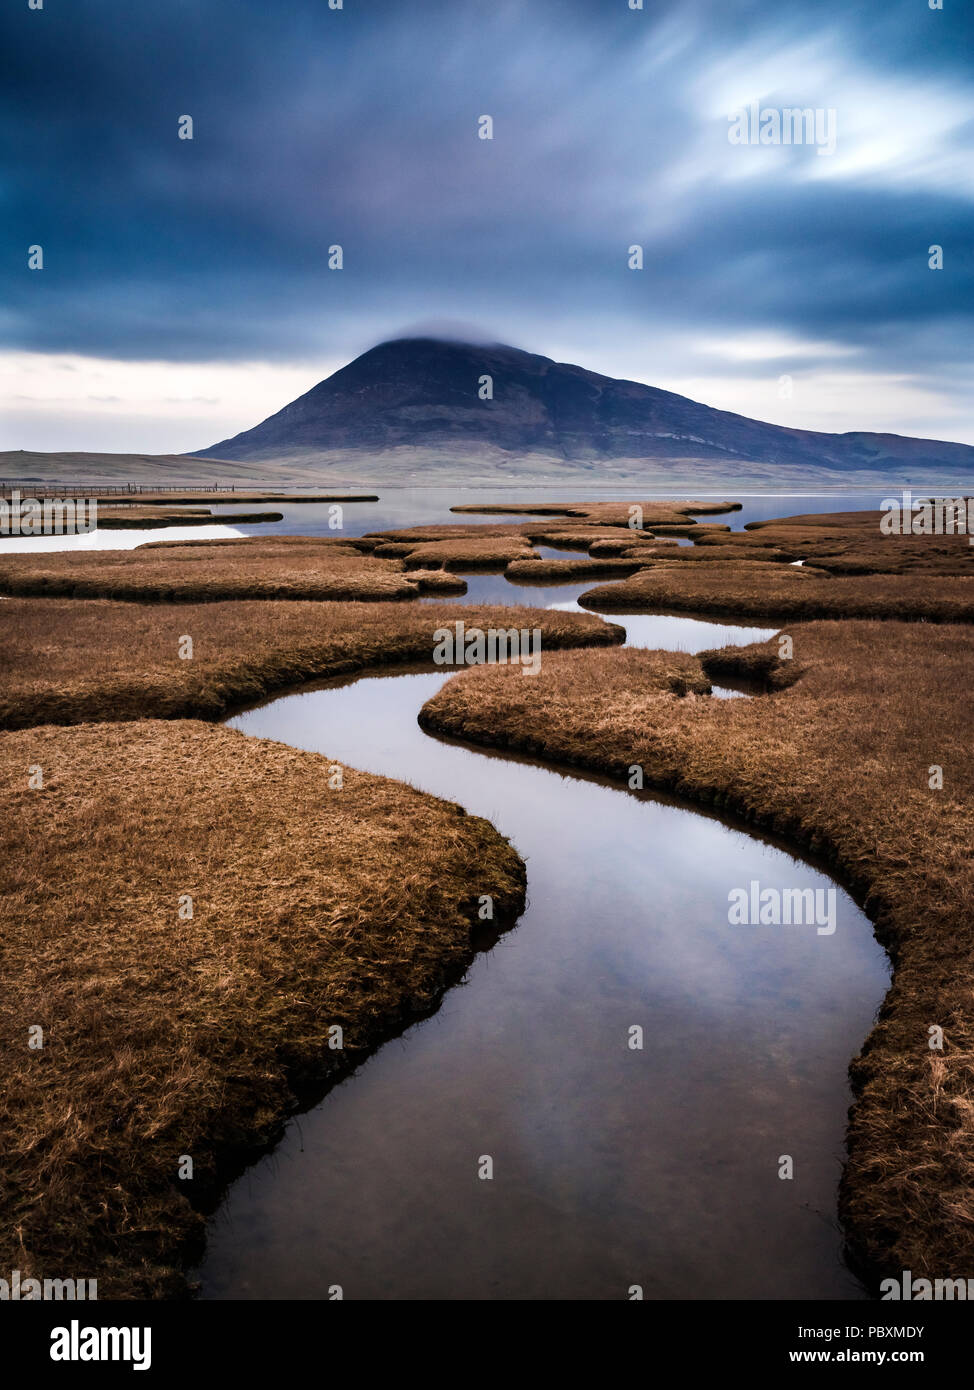 Ceapabhal hill, Chaipaval and Northton Salt Marsh, Isle of Harris, Scotland, UK, Europe - Stock Image